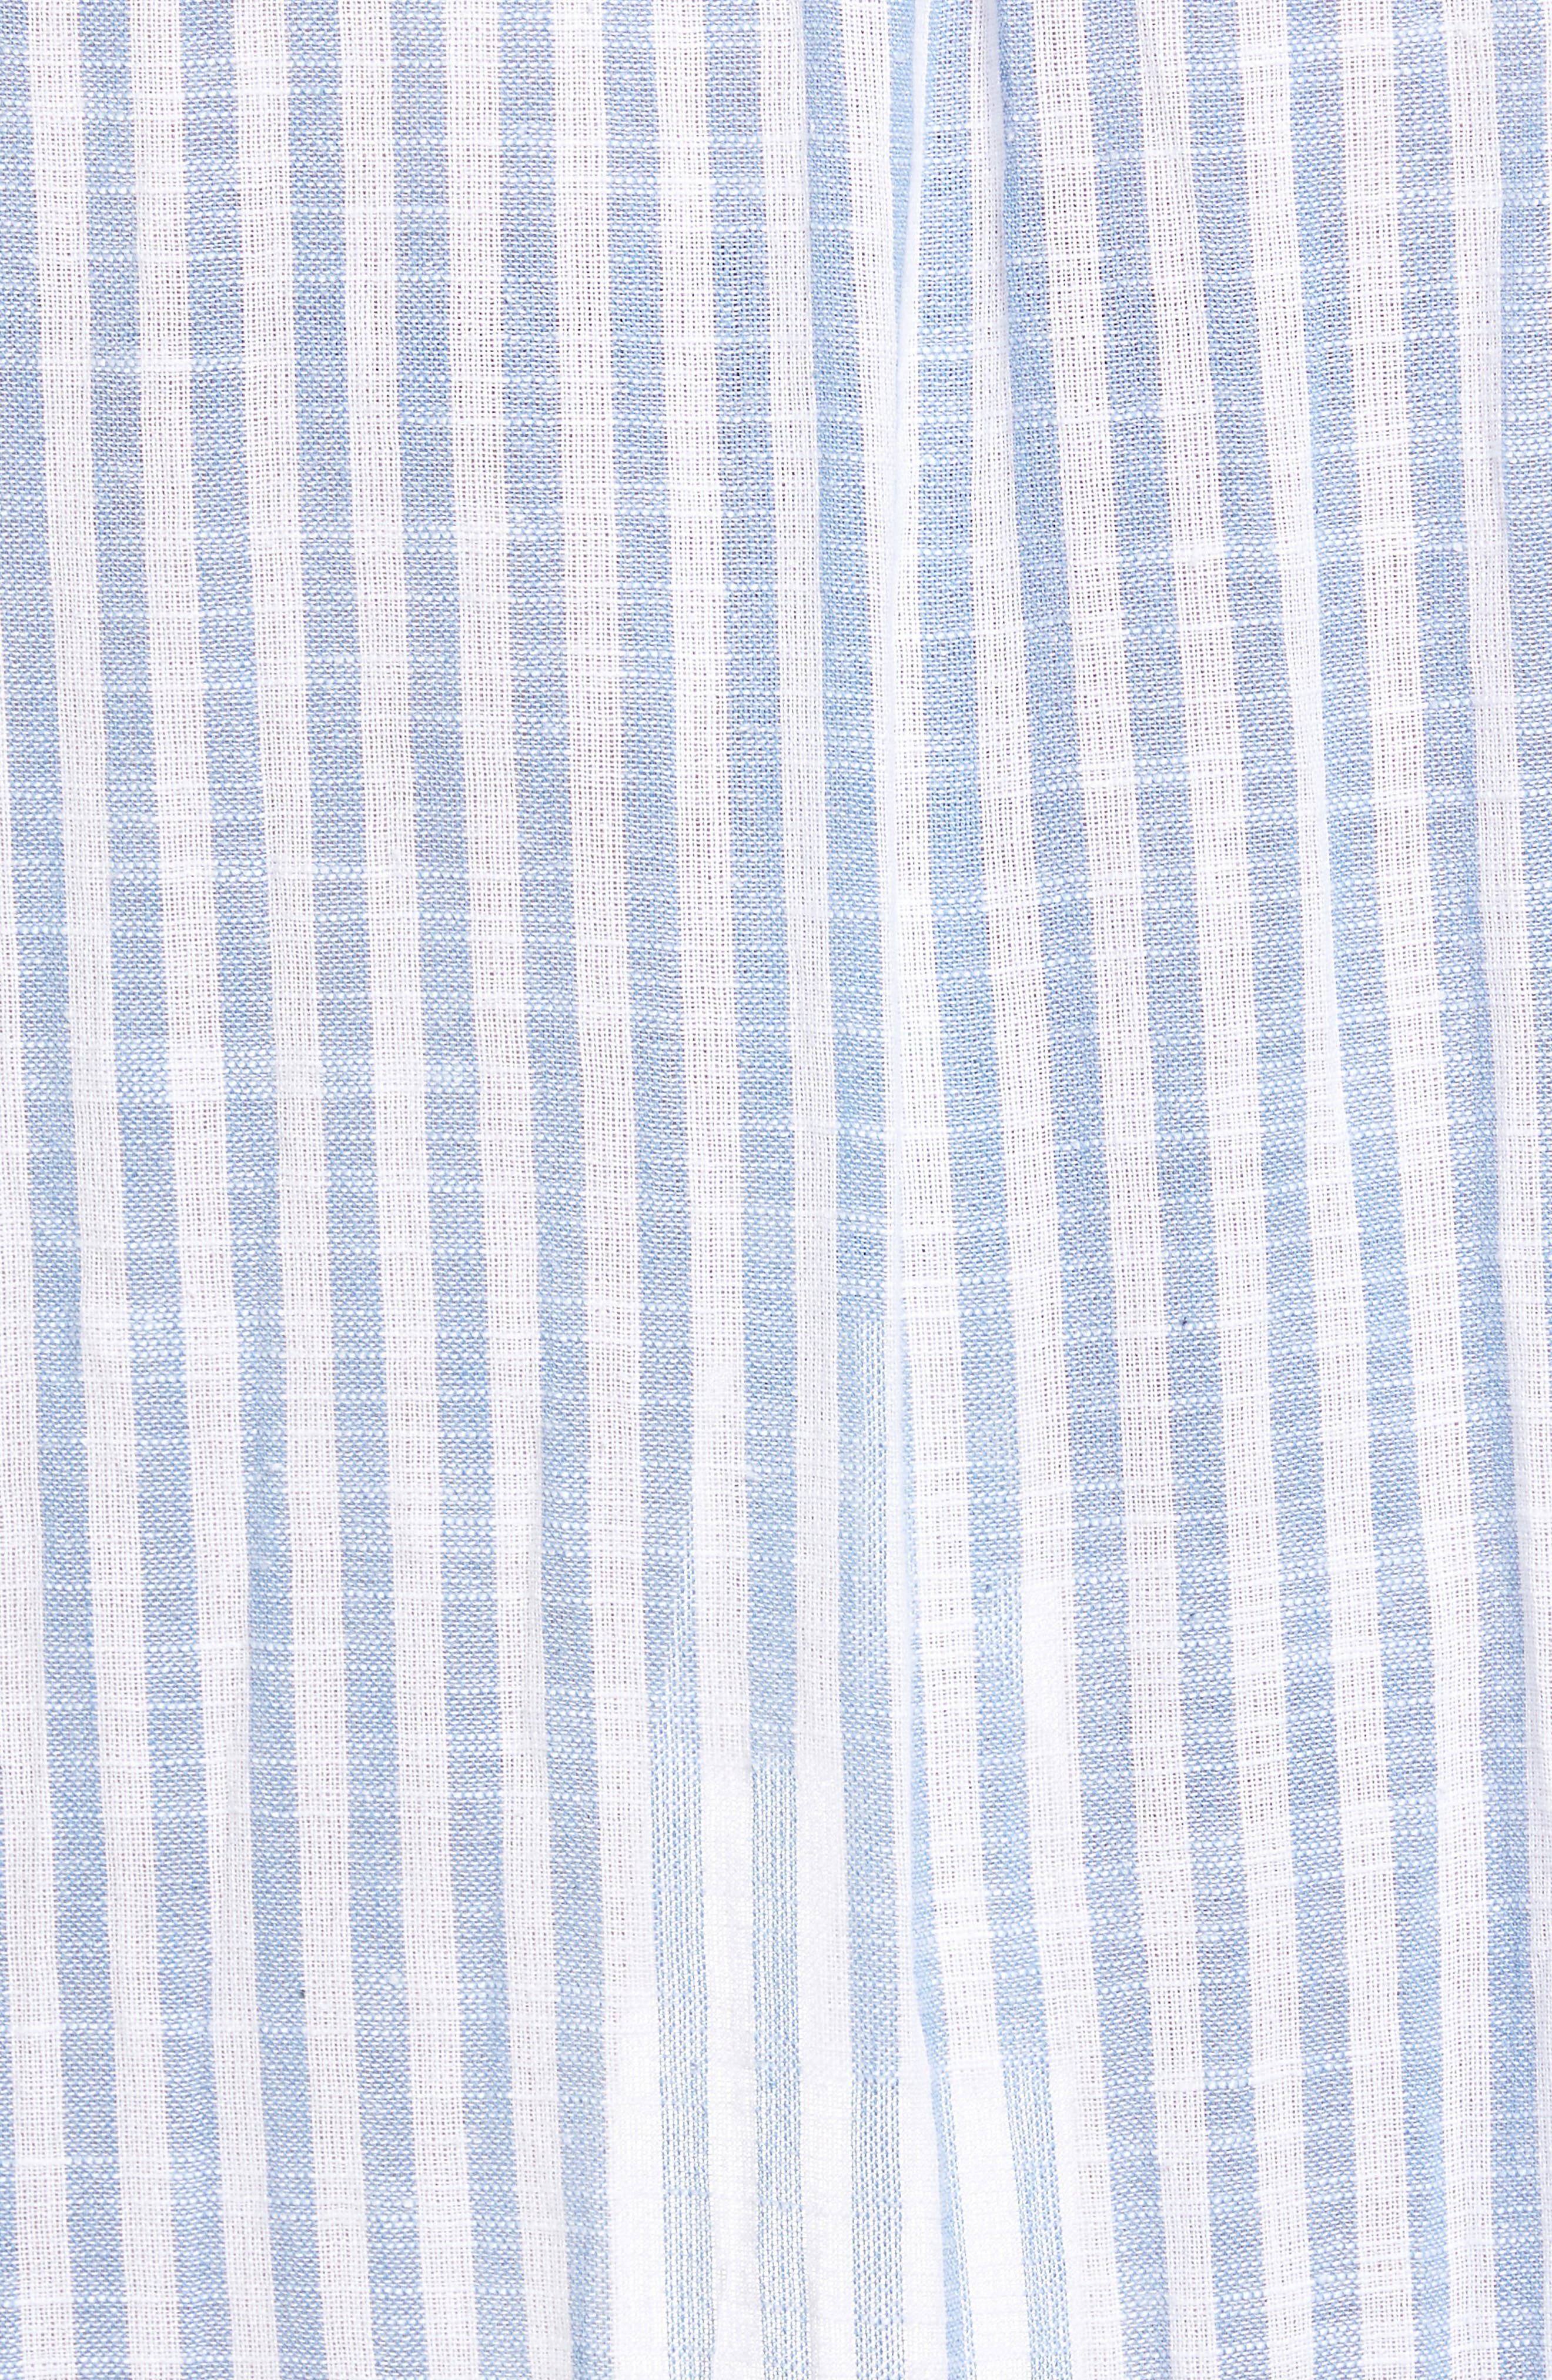 Rosero Ruffle High/Low Skirt,                             Alternate thumbnail 5, color,                             477